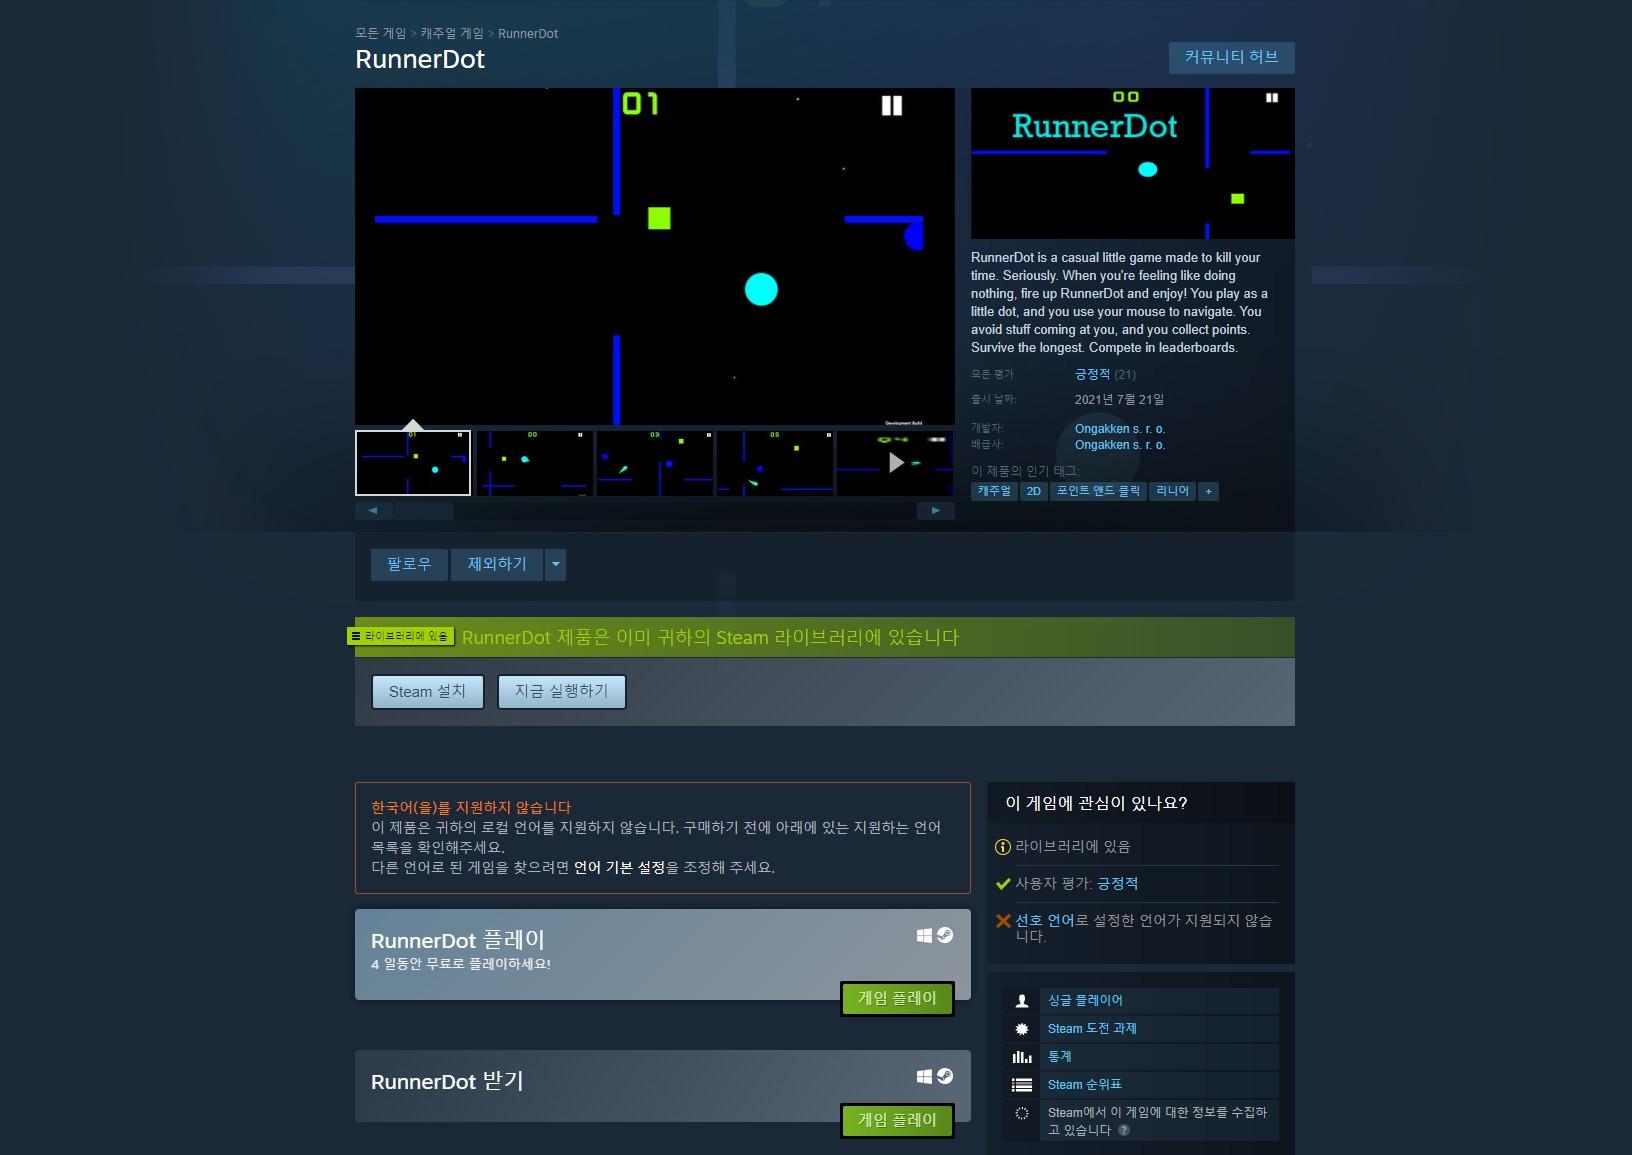 FireShot Capture 018 - RunnerDot 상품을 Steam에서 구매하고 100% 절약하세요. - store.steampowered.com.jpg